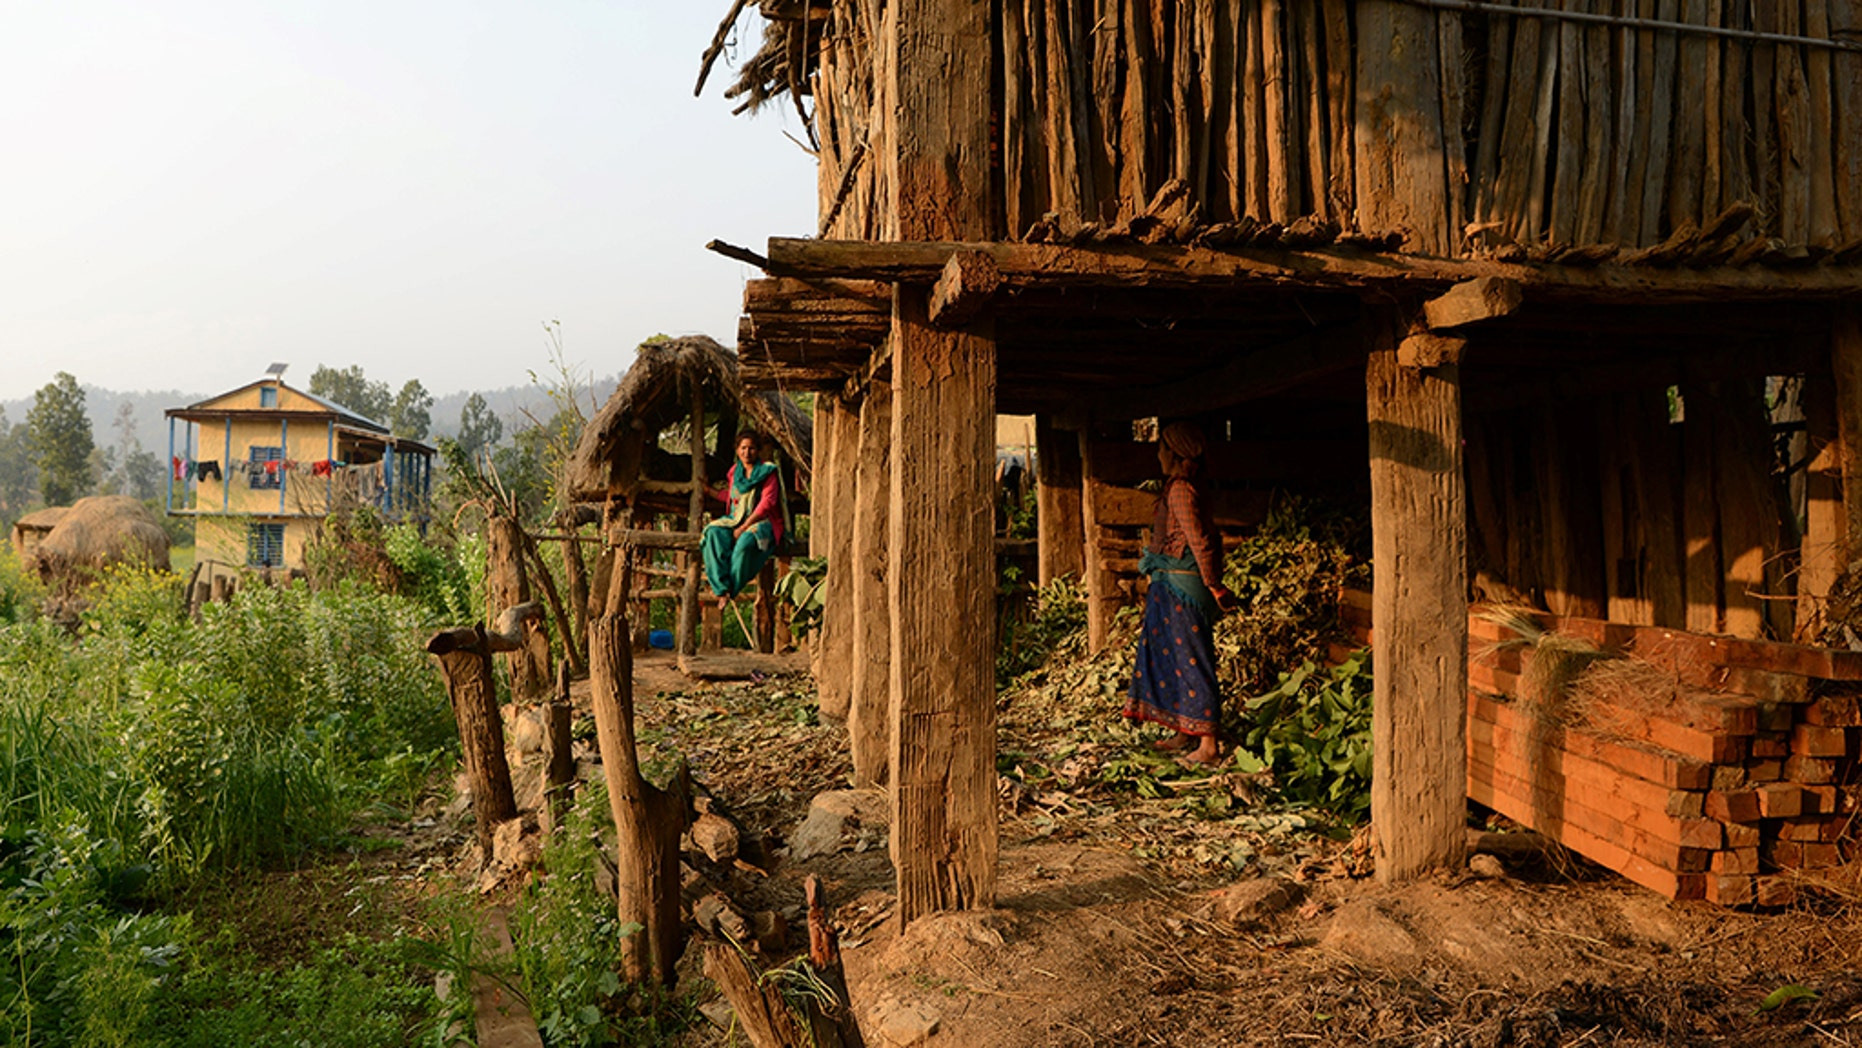 In this photograph taken on February 3, 2017, Nepalese woman Yum Kumari Giri looks at a Chhaupadi hut during her menstruation period in Surkhet District, some 520km west of Kathmandu.